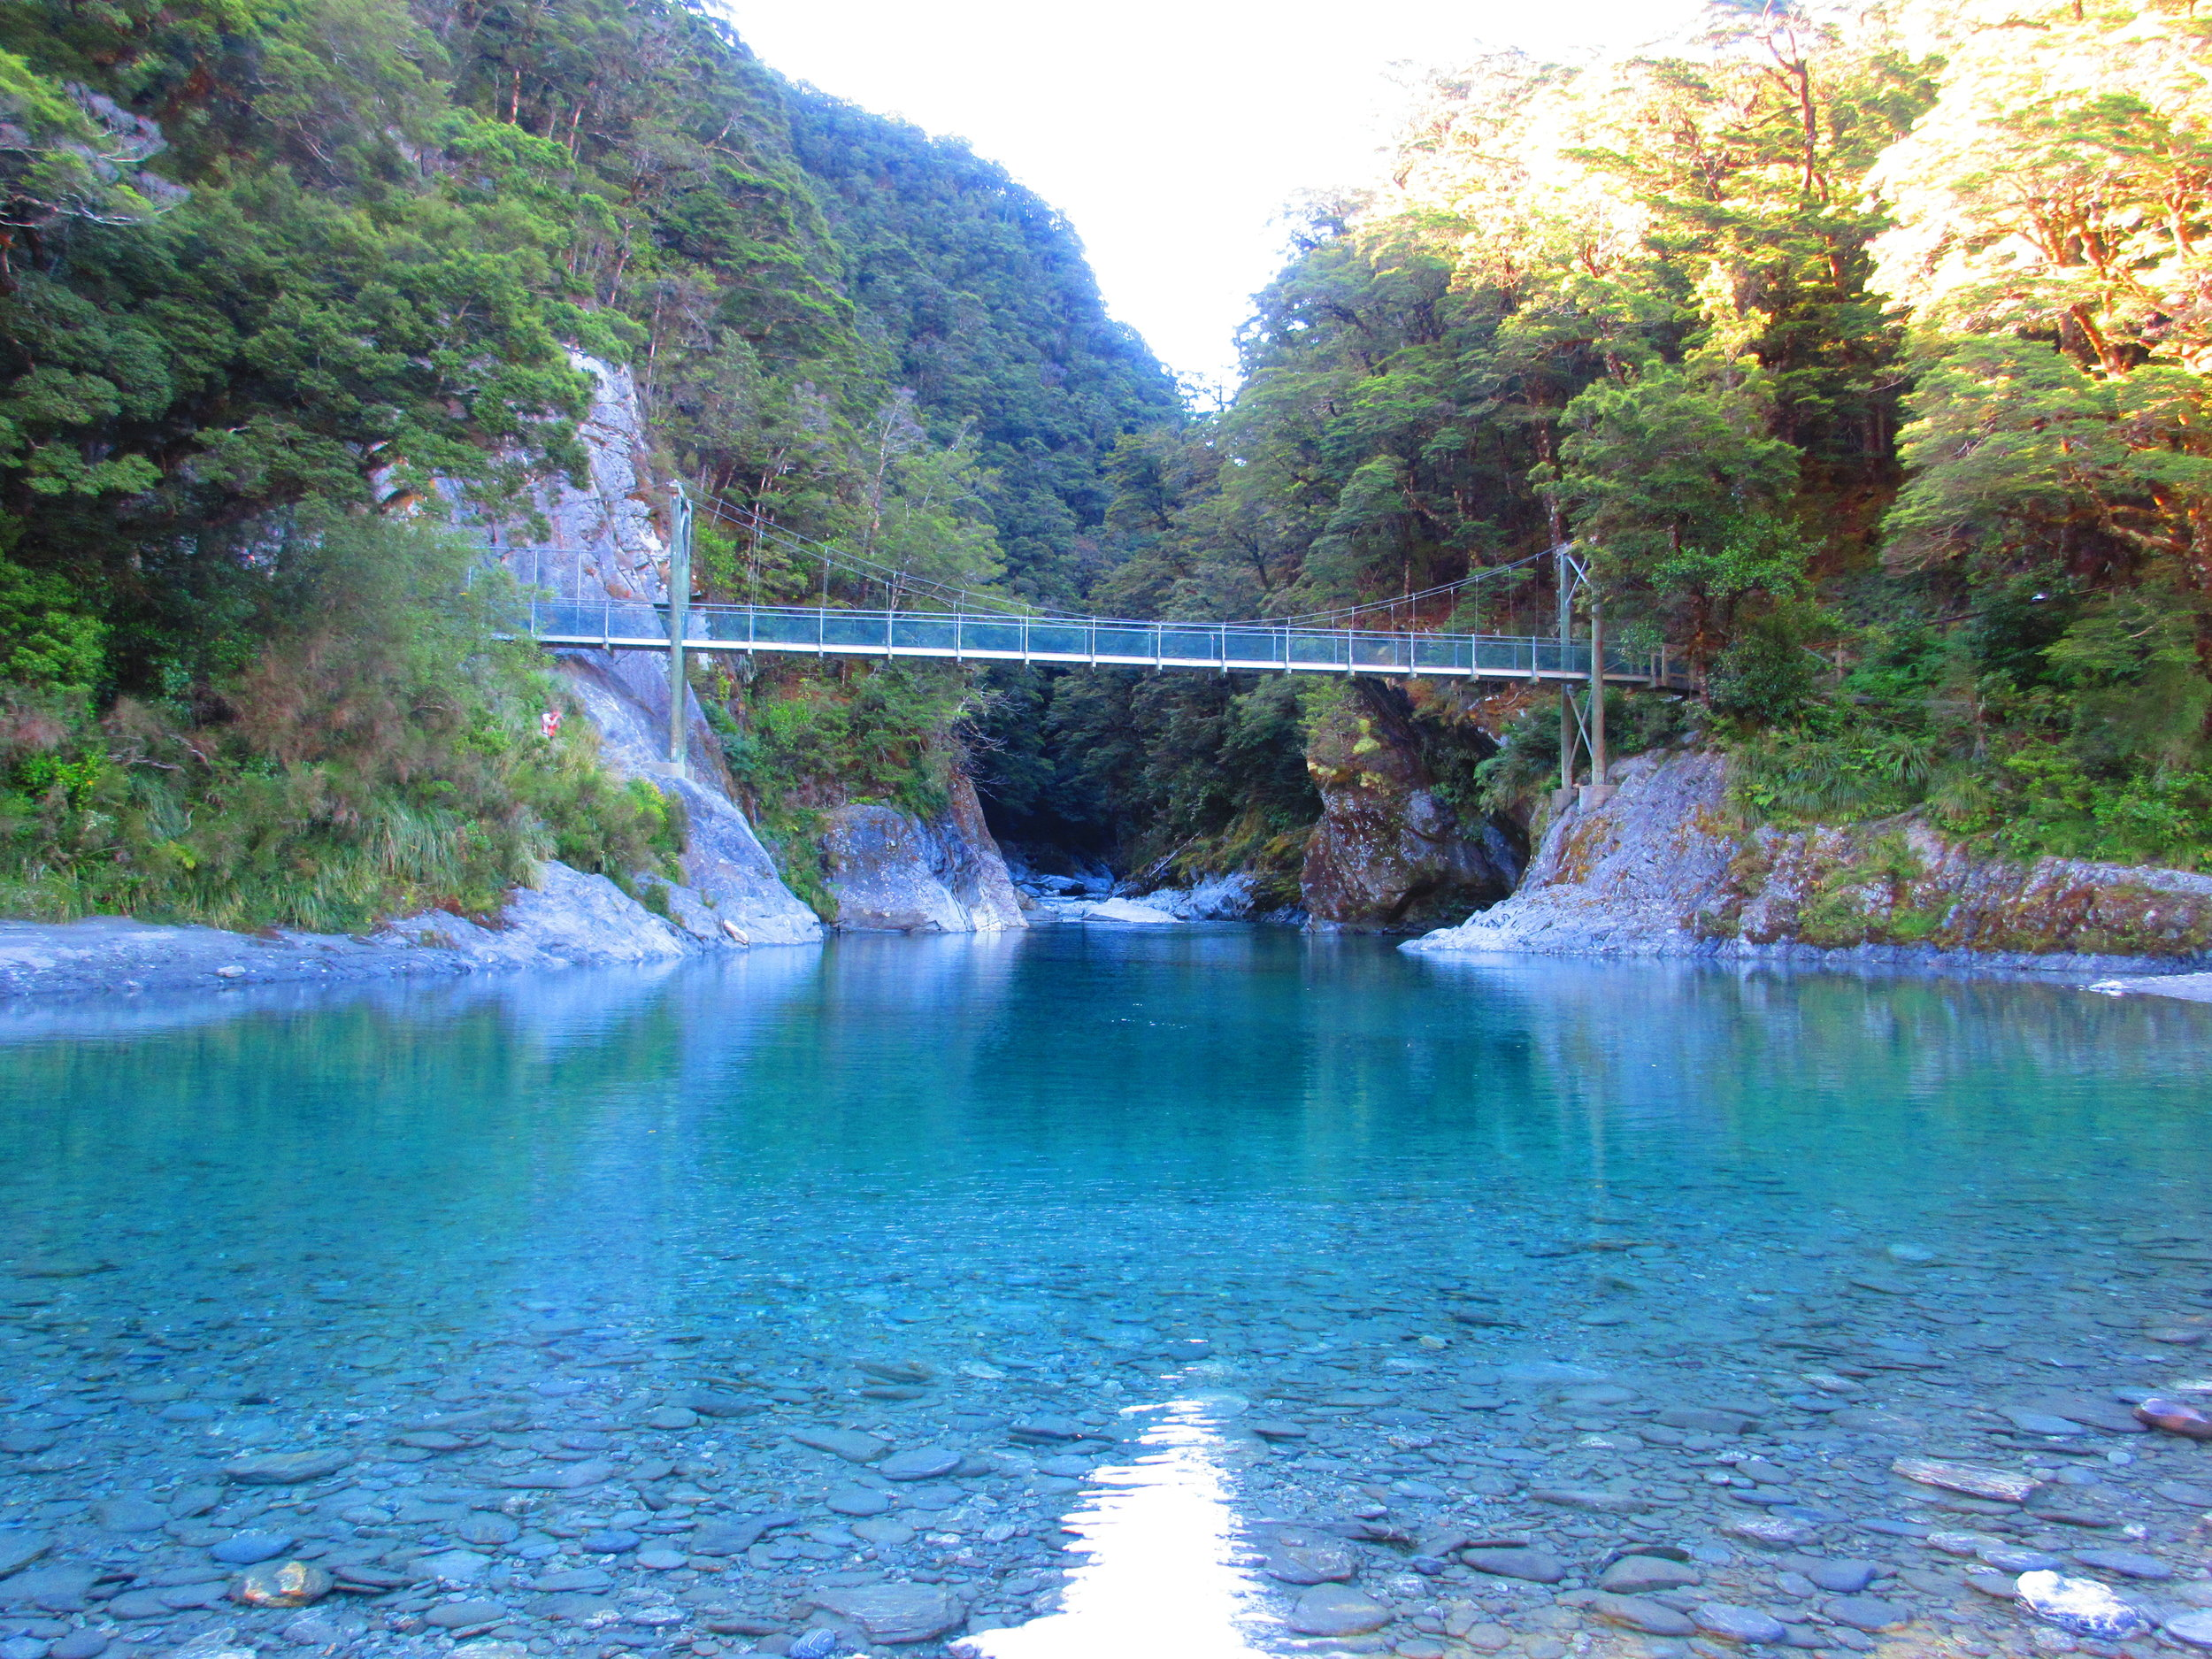 Blue Pools, Mount Aspiring National Park, New Zealand